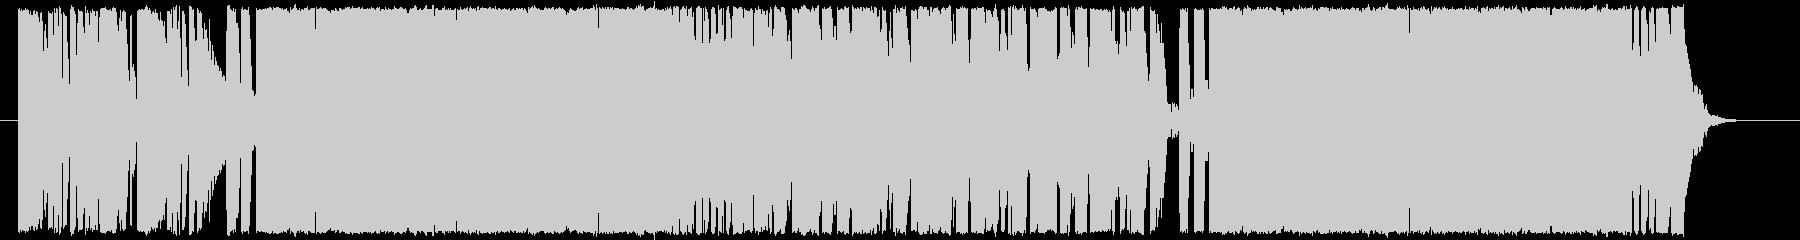 EDM・トレンド感のあるダンスチューンの未再生の波形